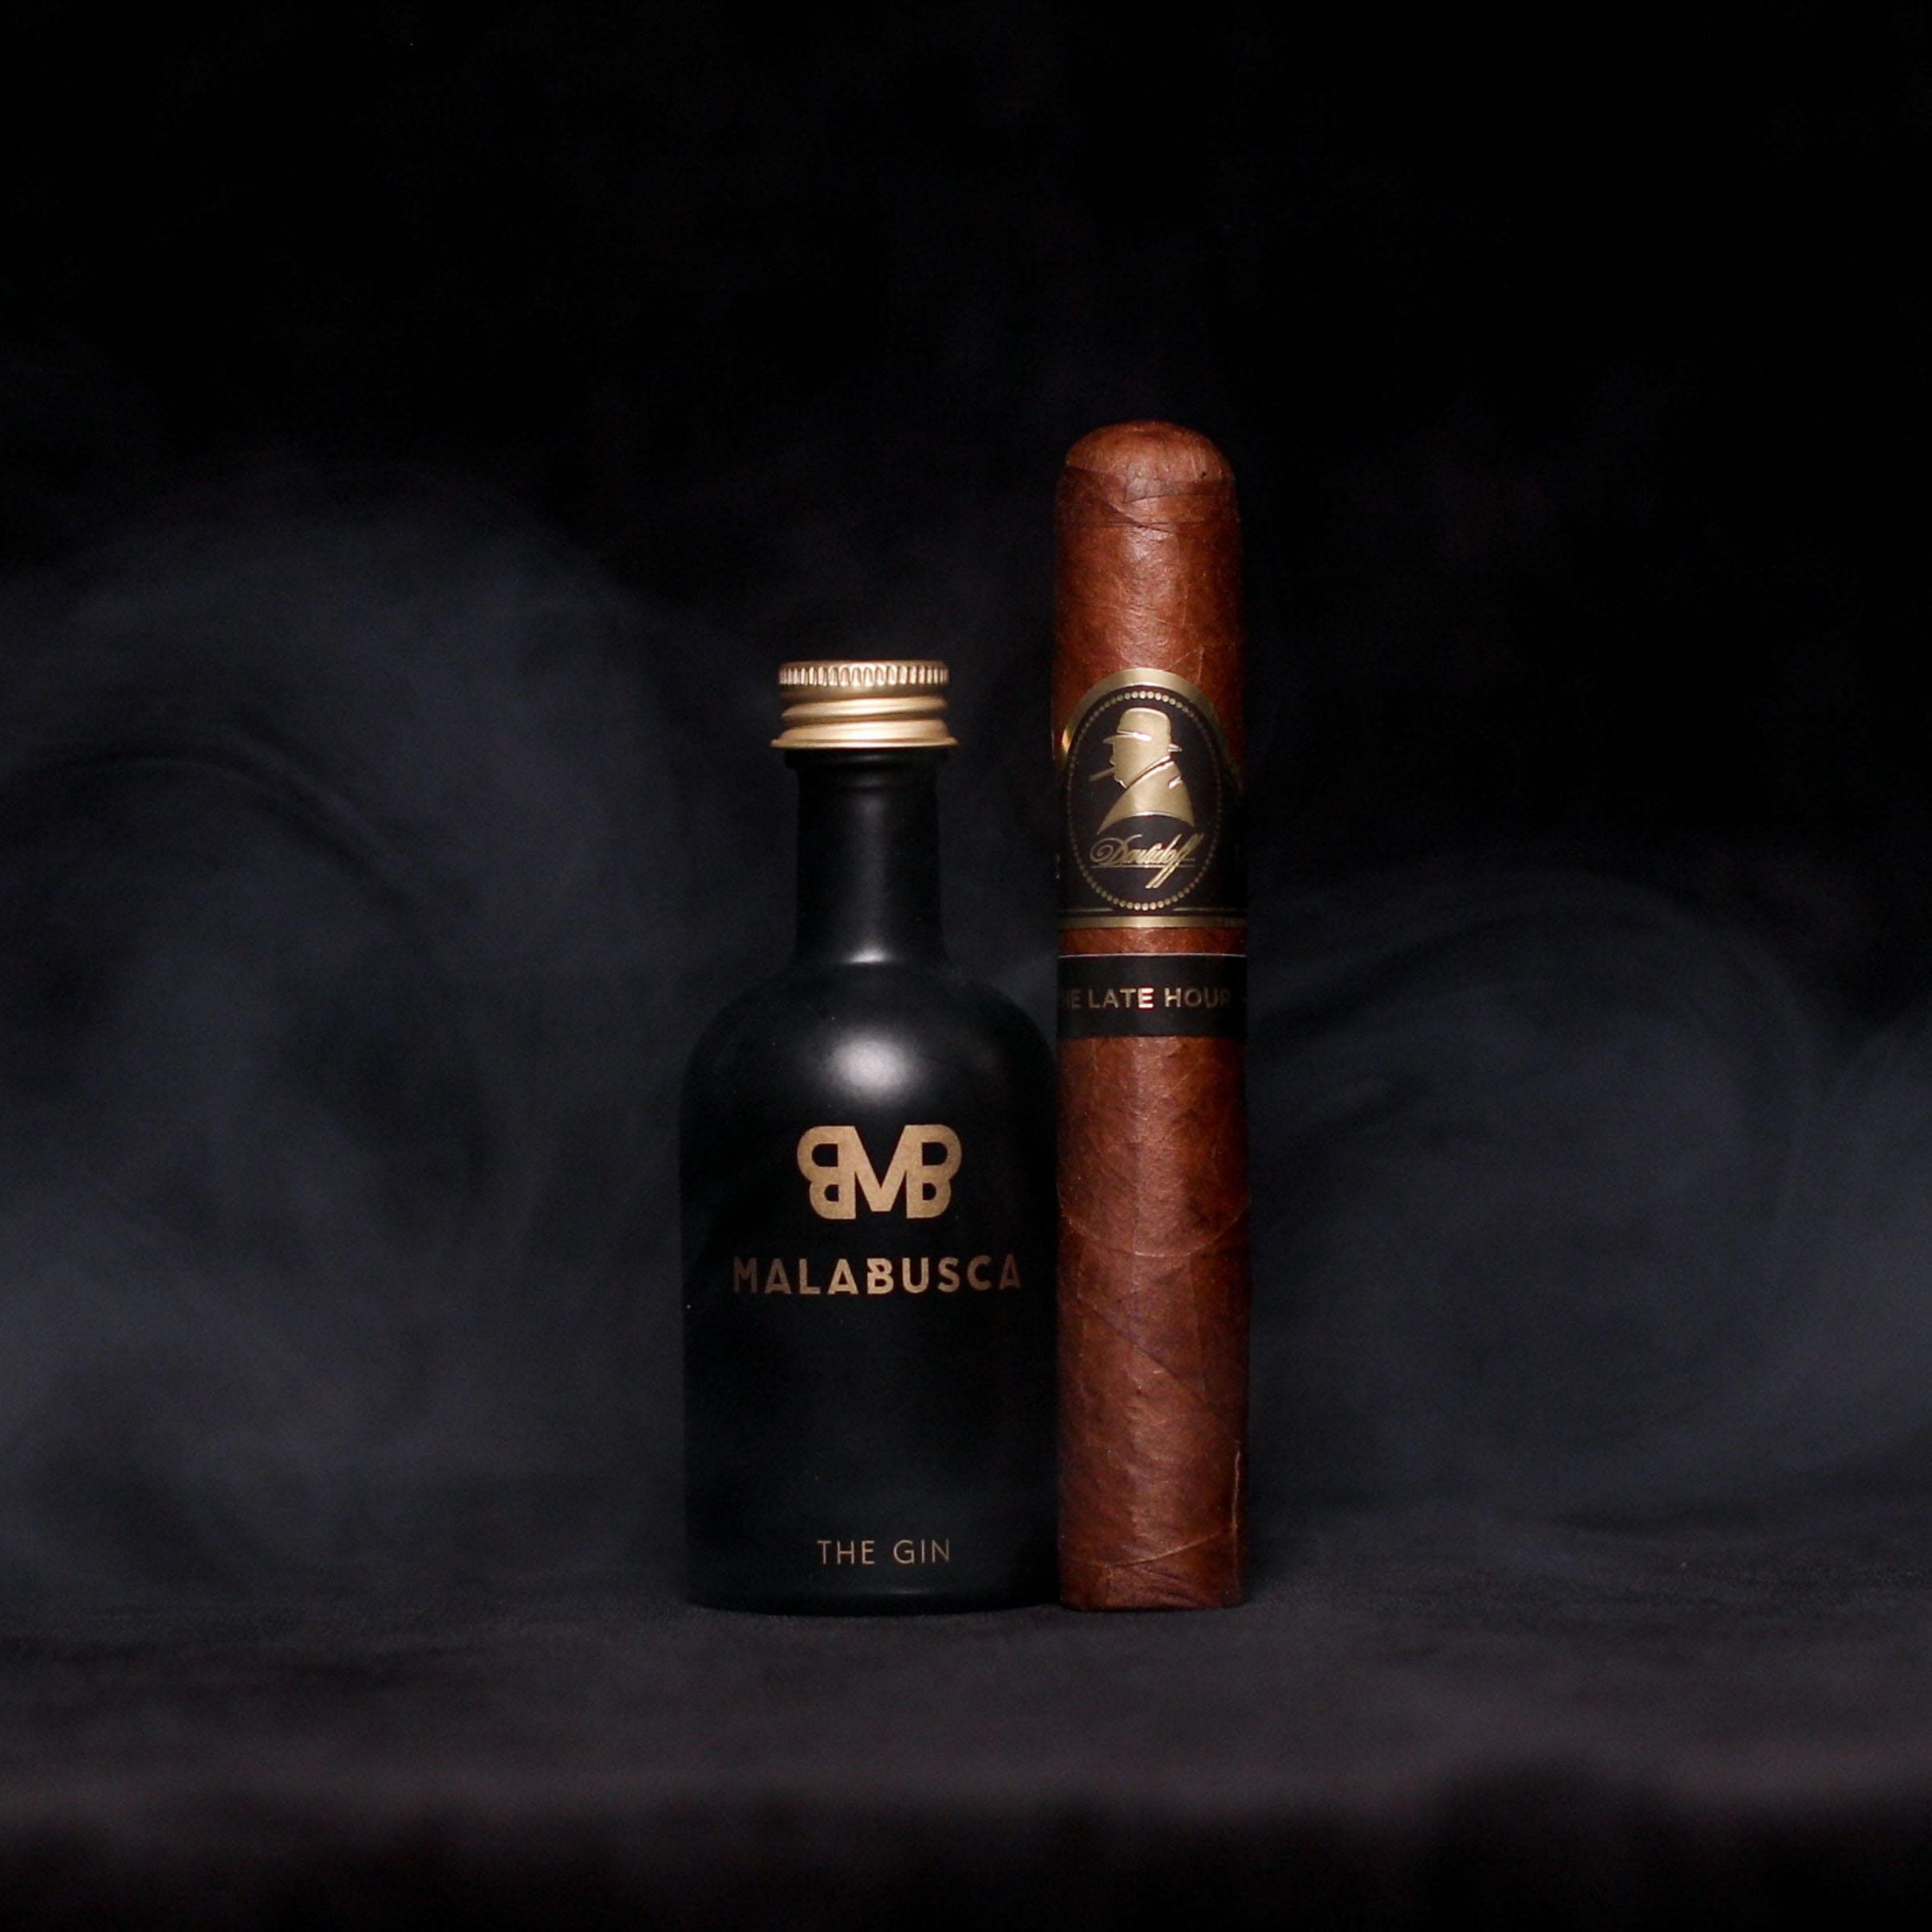 Cigar Specialist malabusca experiencia